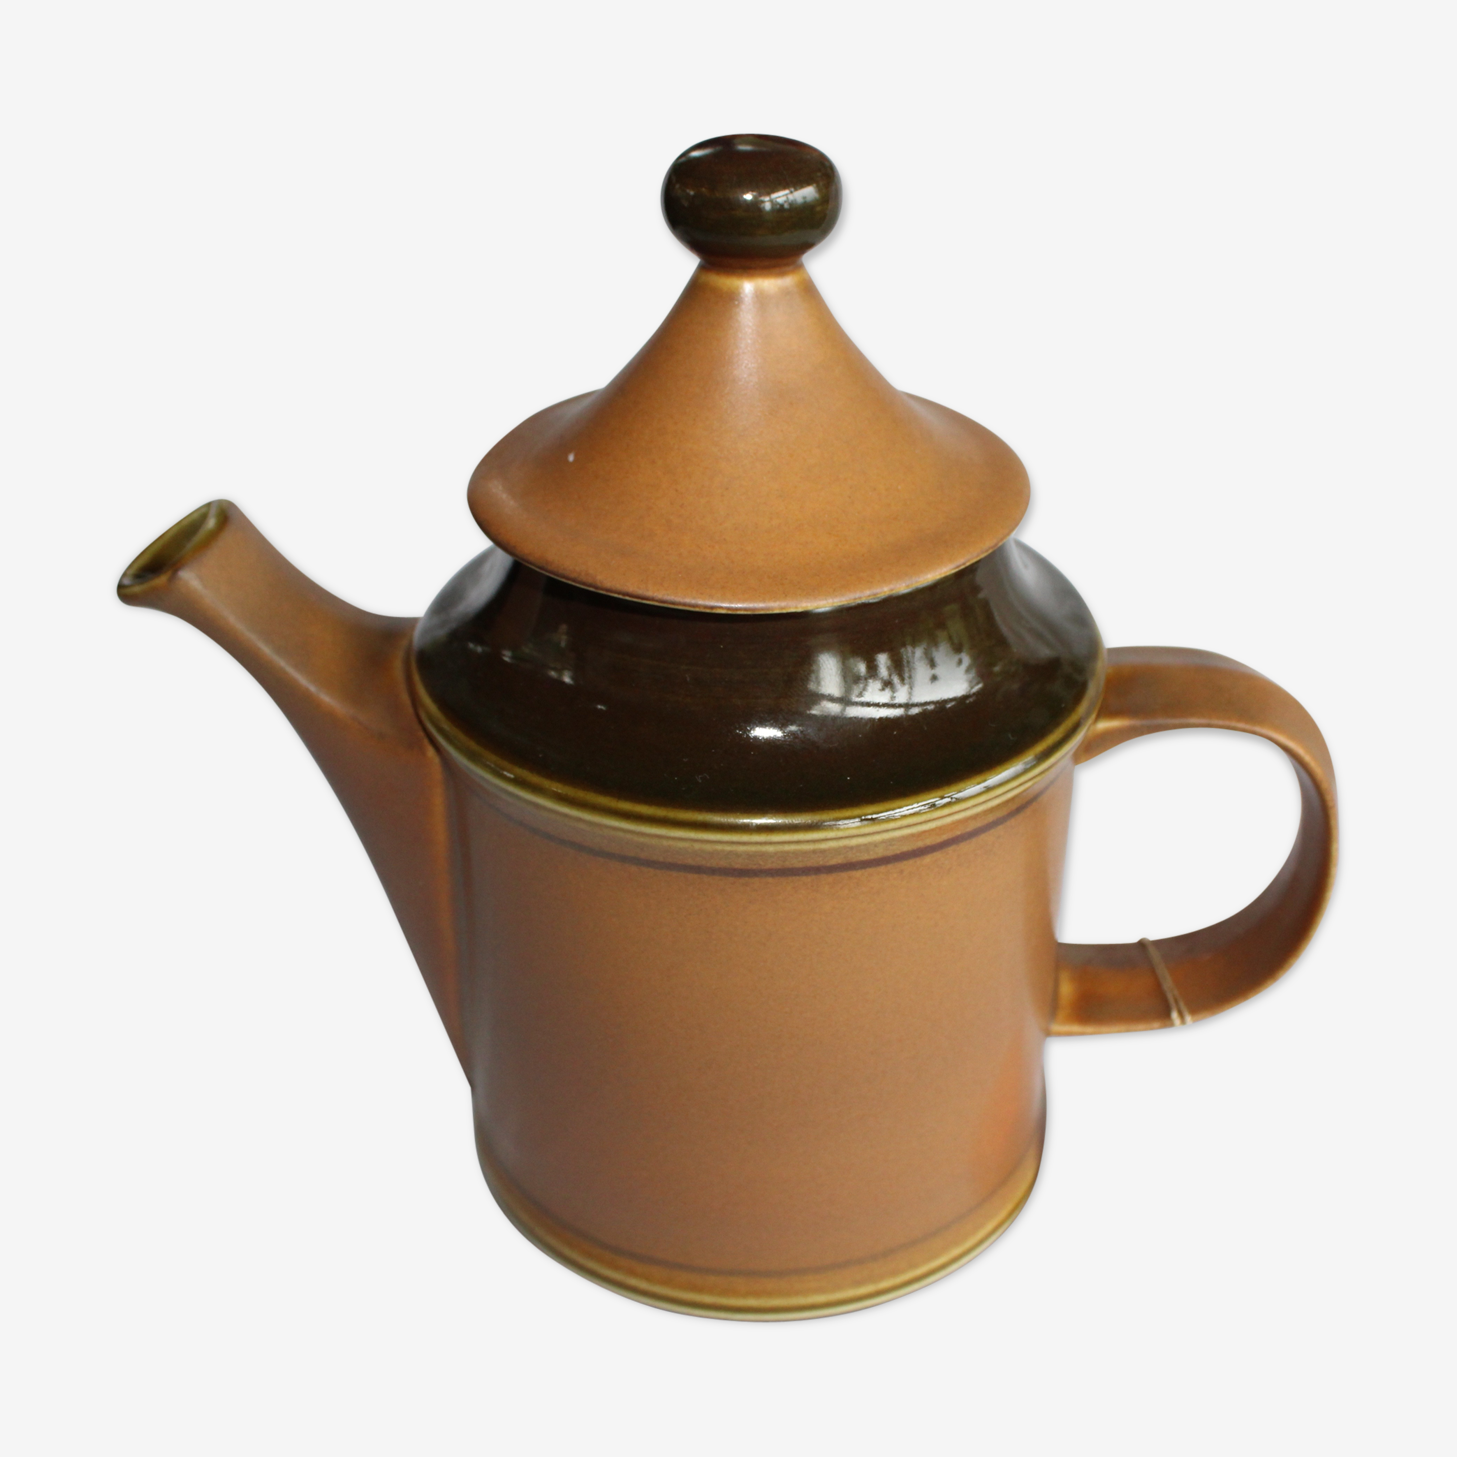 Coffee pot Goebel country Brittany Bavaria w. Germany vintage